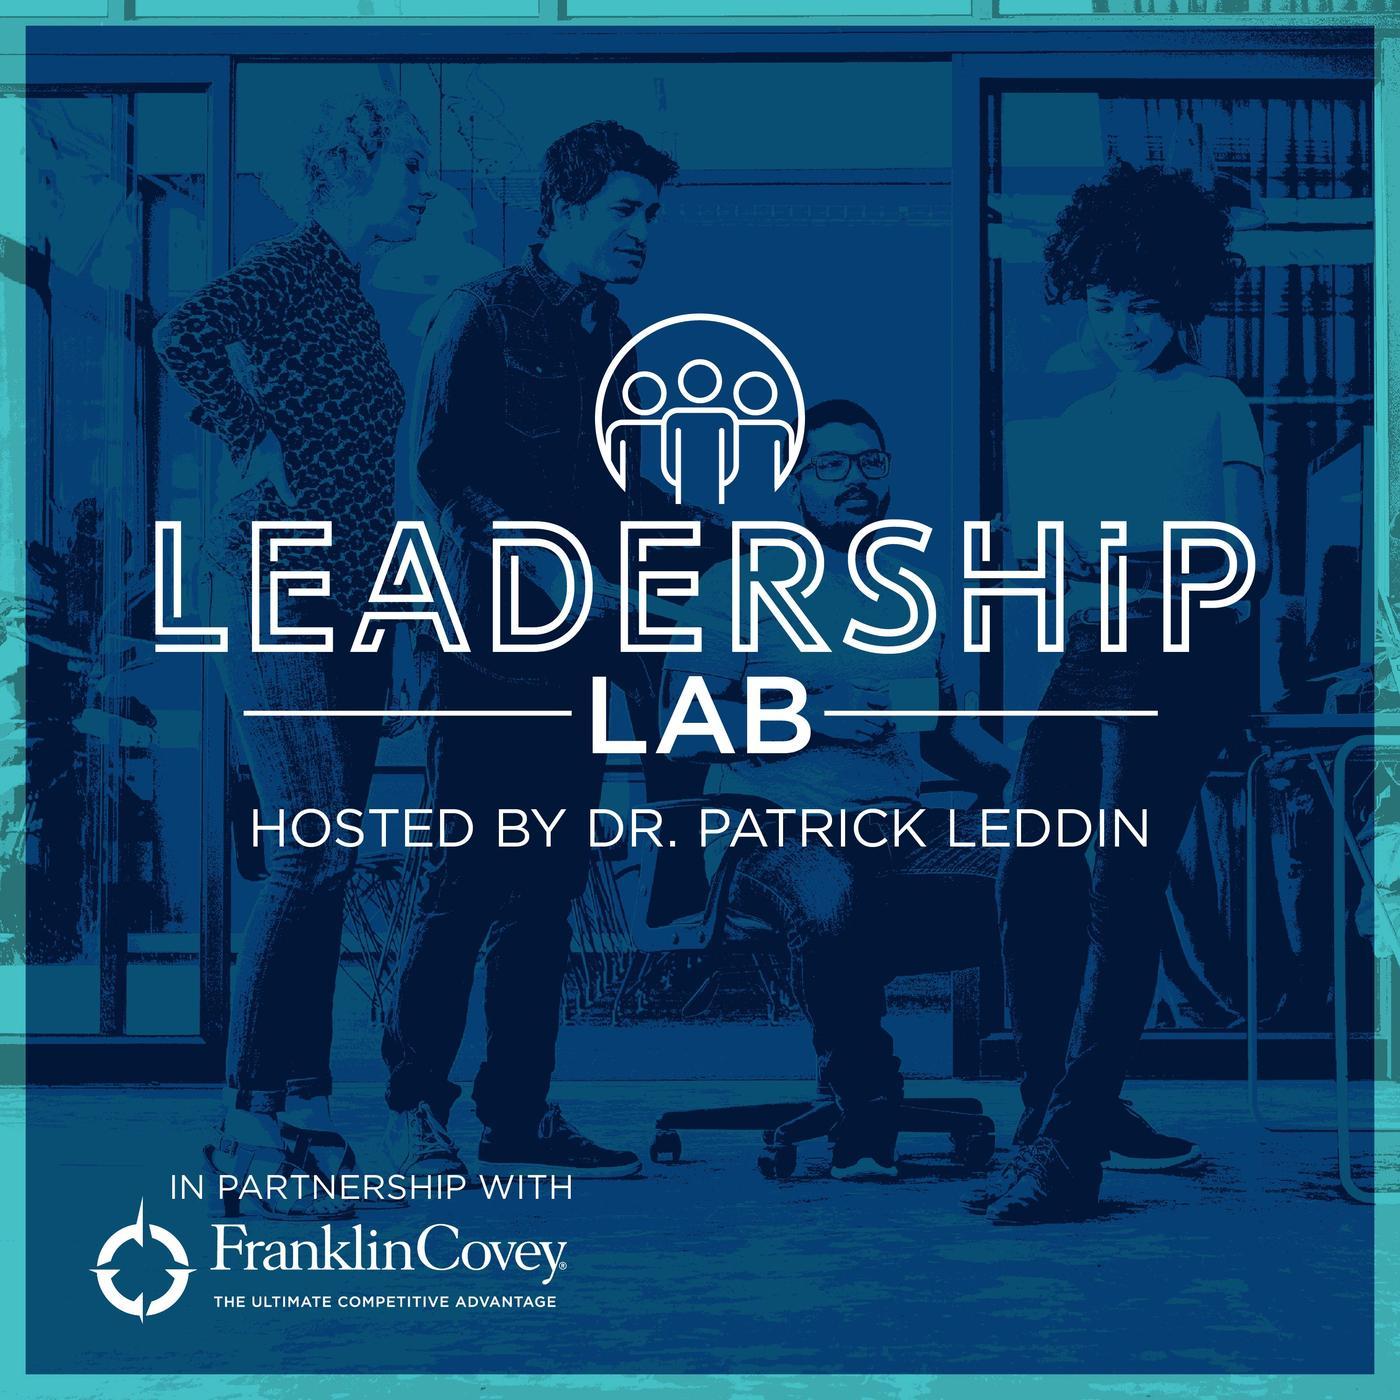 leadership-lab-with-dr-patrick-leddin-xkWgGEYZzSc-v8xJ1_TE0oq.1400x1400